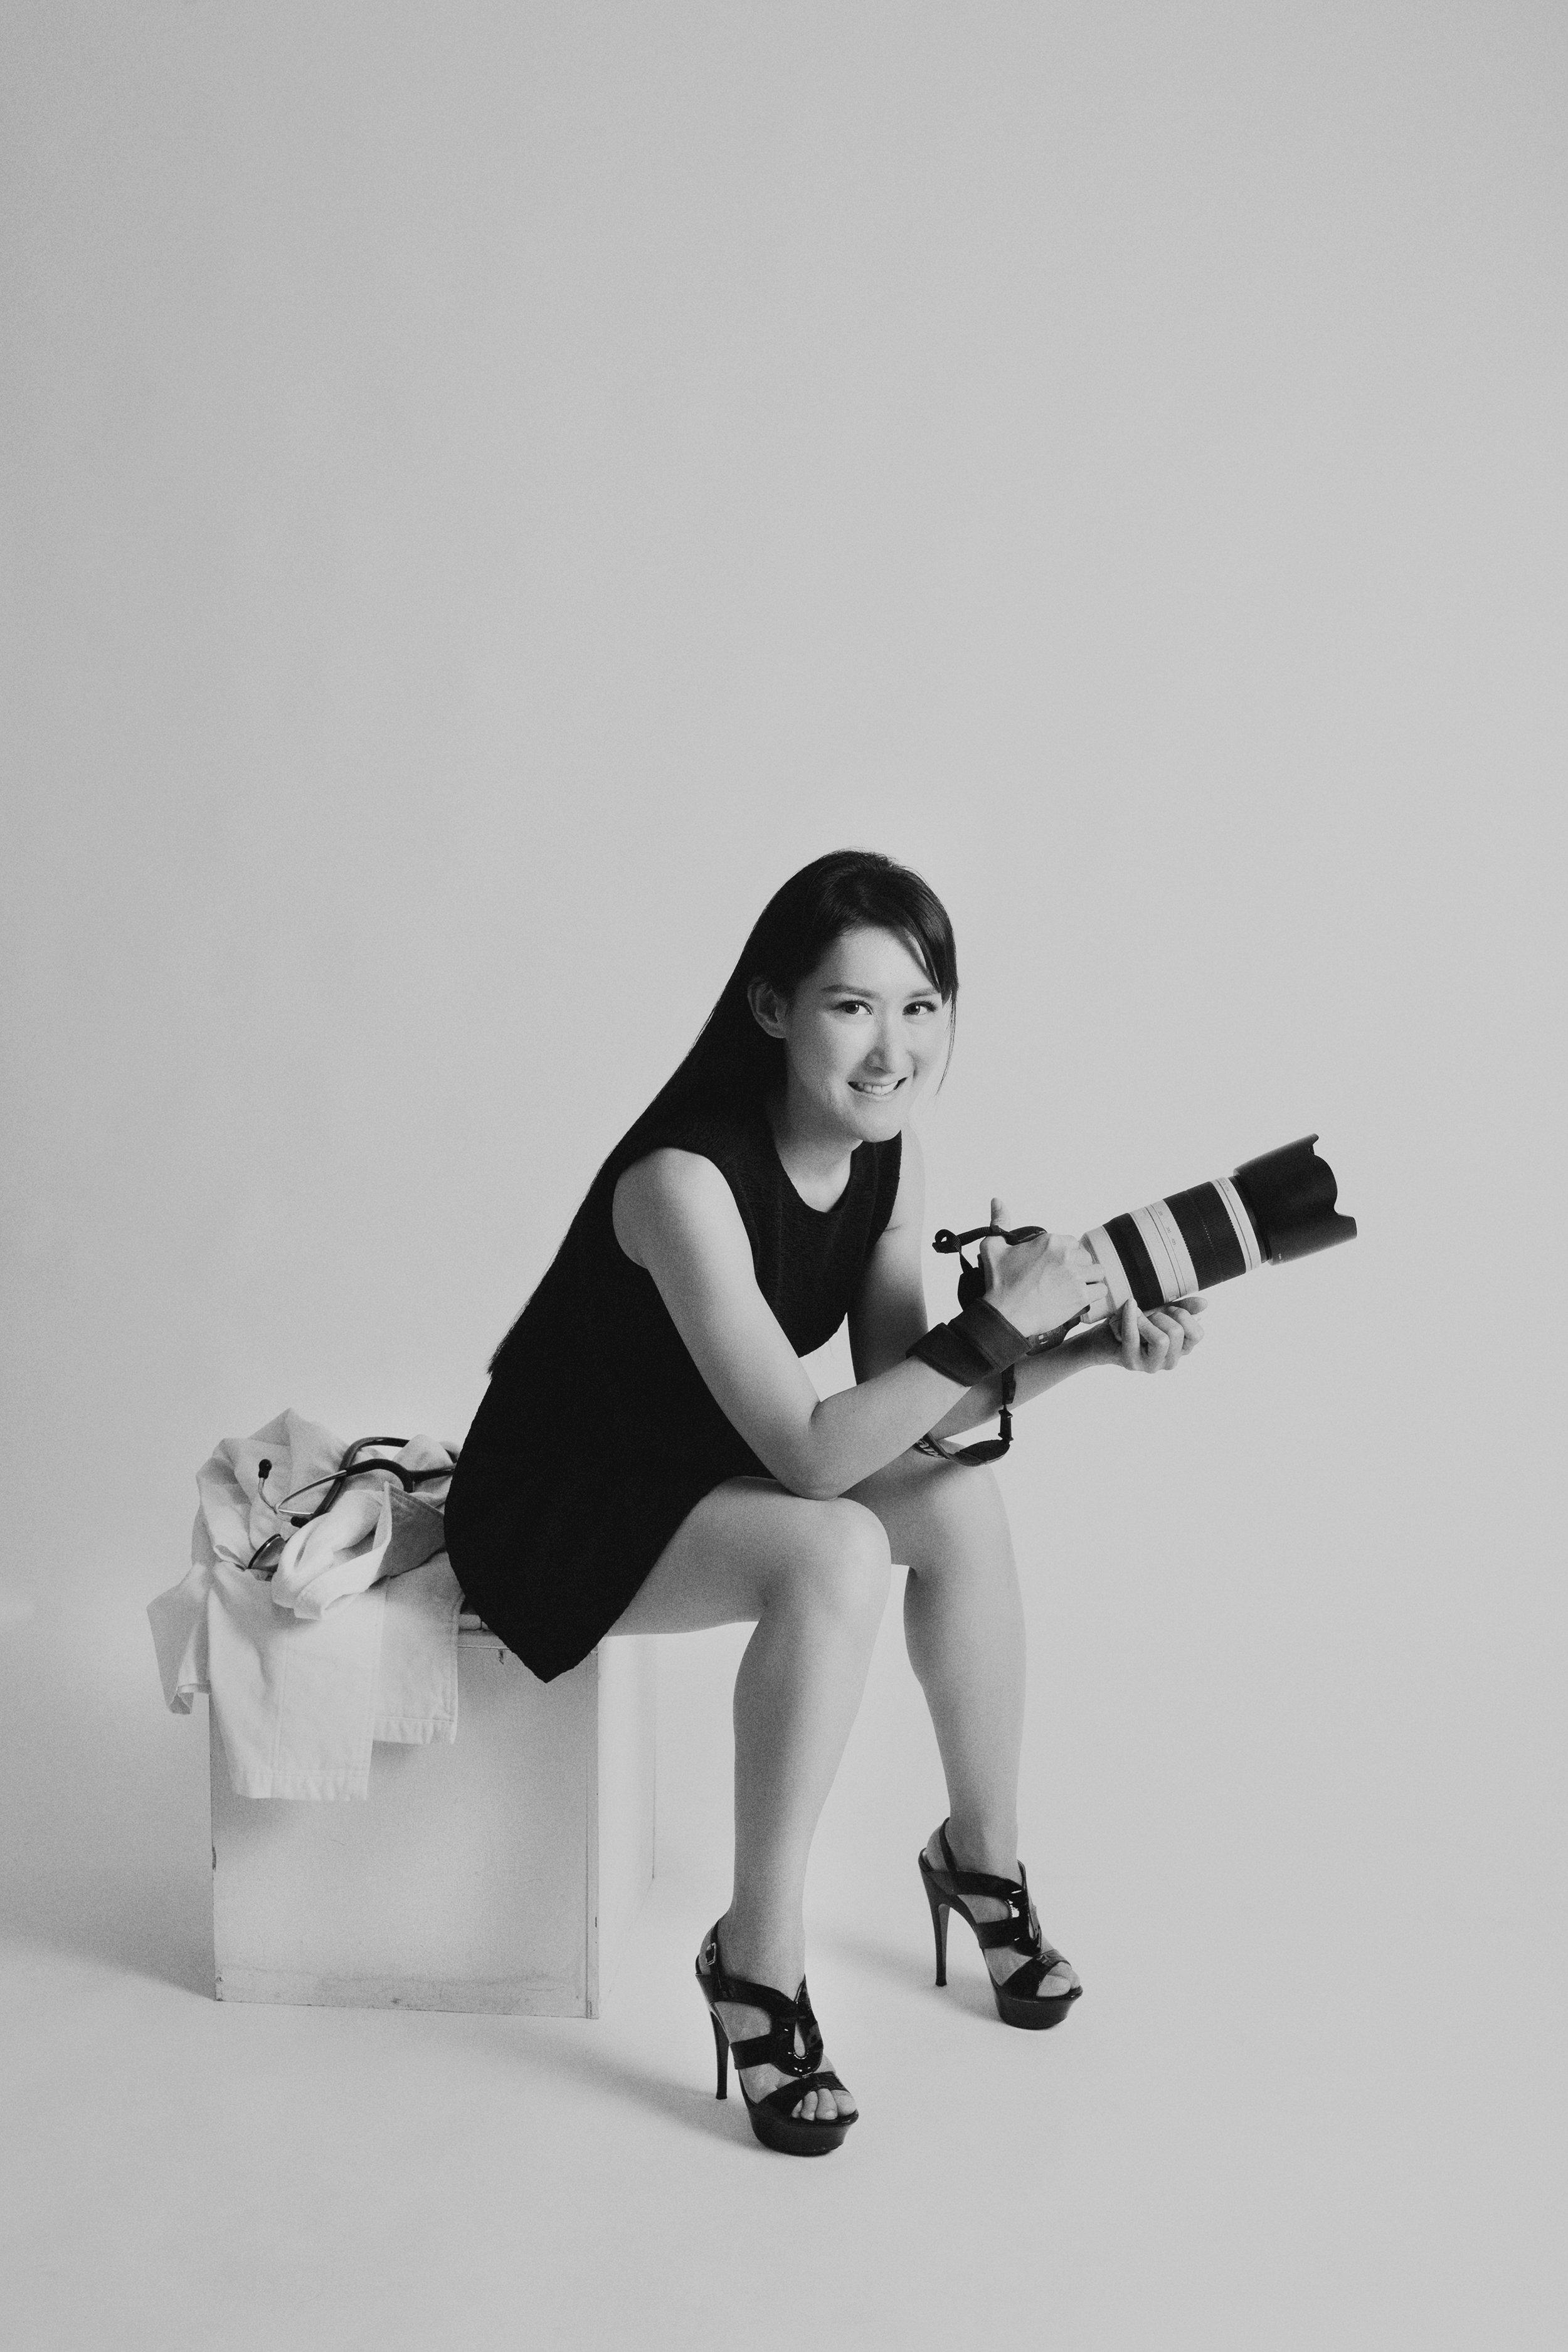 JC CREATIVE 女性攝影師   形像照 人像寫真  photogrpaher   台北推薦婚攝 自然風格 溫度故事 孕婦 愛  台北家庭寫真  自宅 獨立攝影師JC   PHOTOGRAPHY   PORTRAIT 圖像00002.JPG